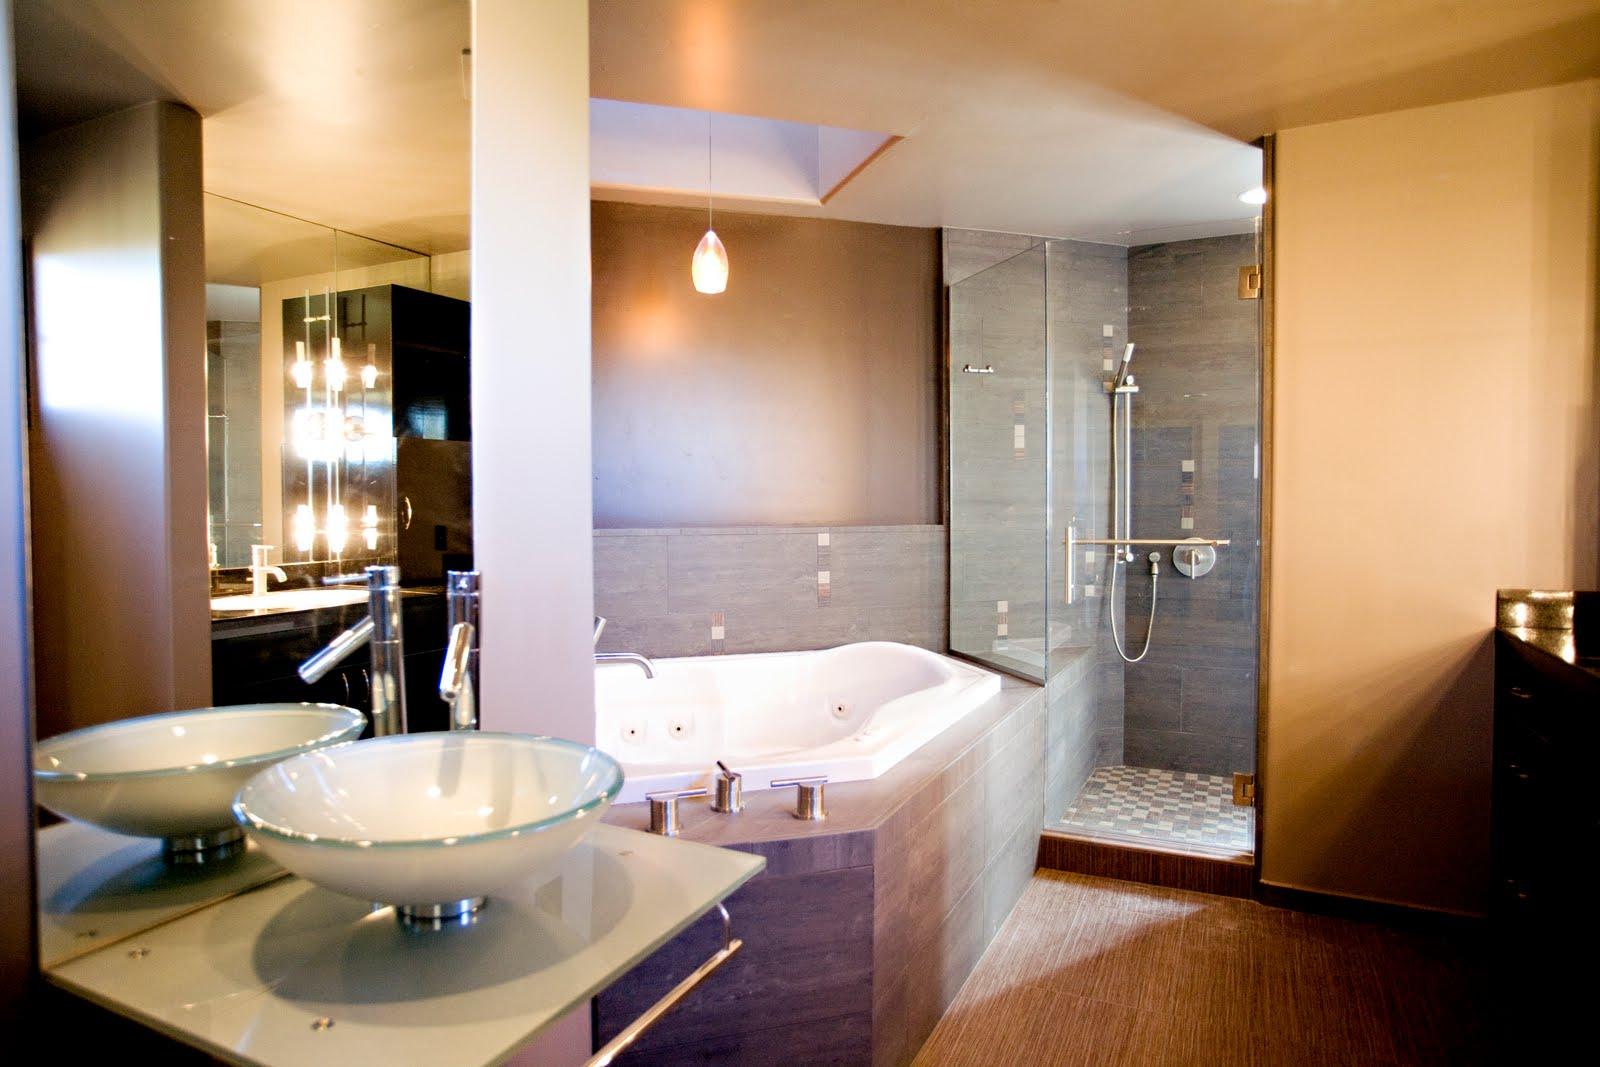 Cc interior designs no slate in master bathroom redo for Redo master bathroom